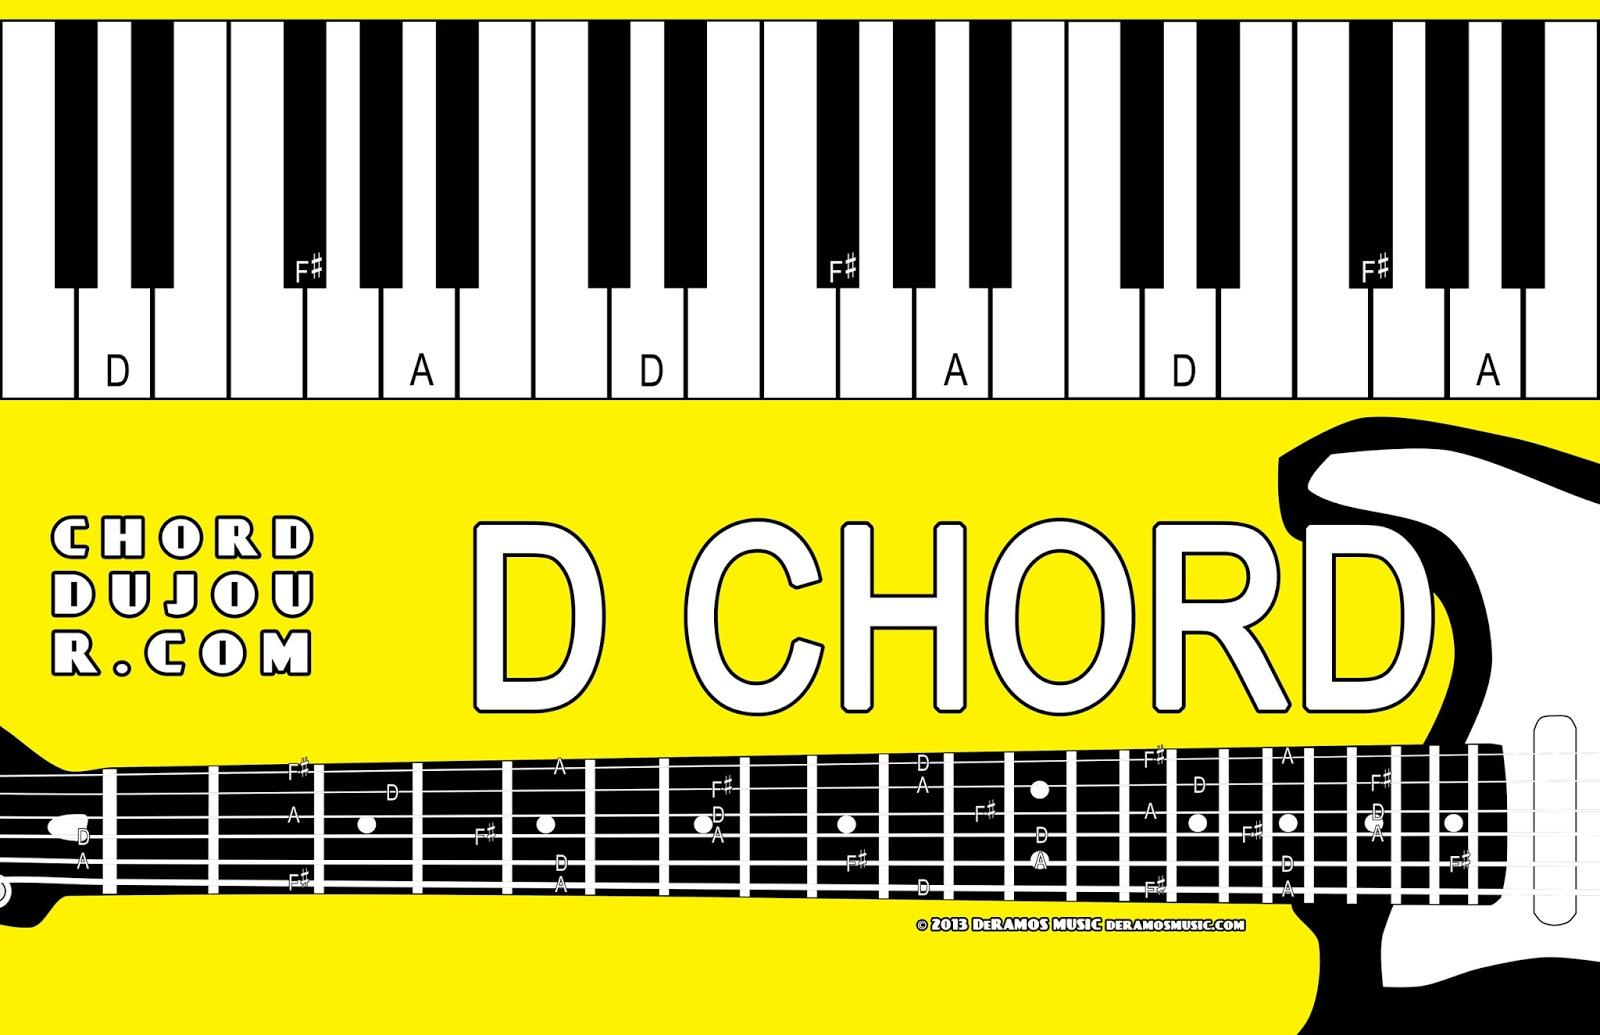 Chord Du Jour August 2013